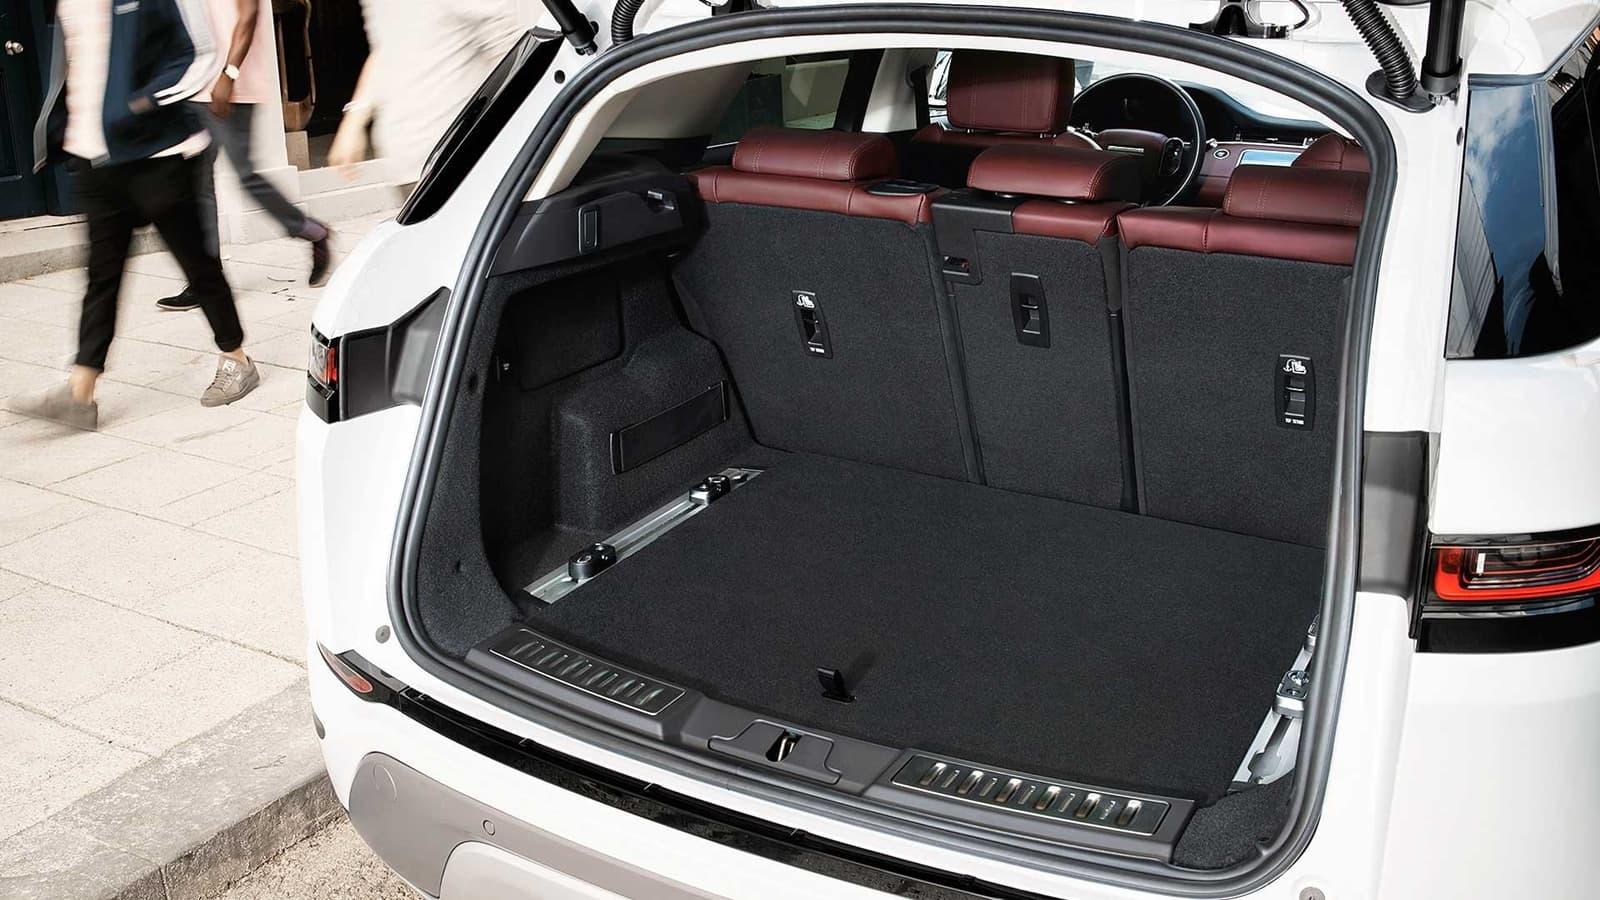 Range Rover Evoque 2019 1118 035